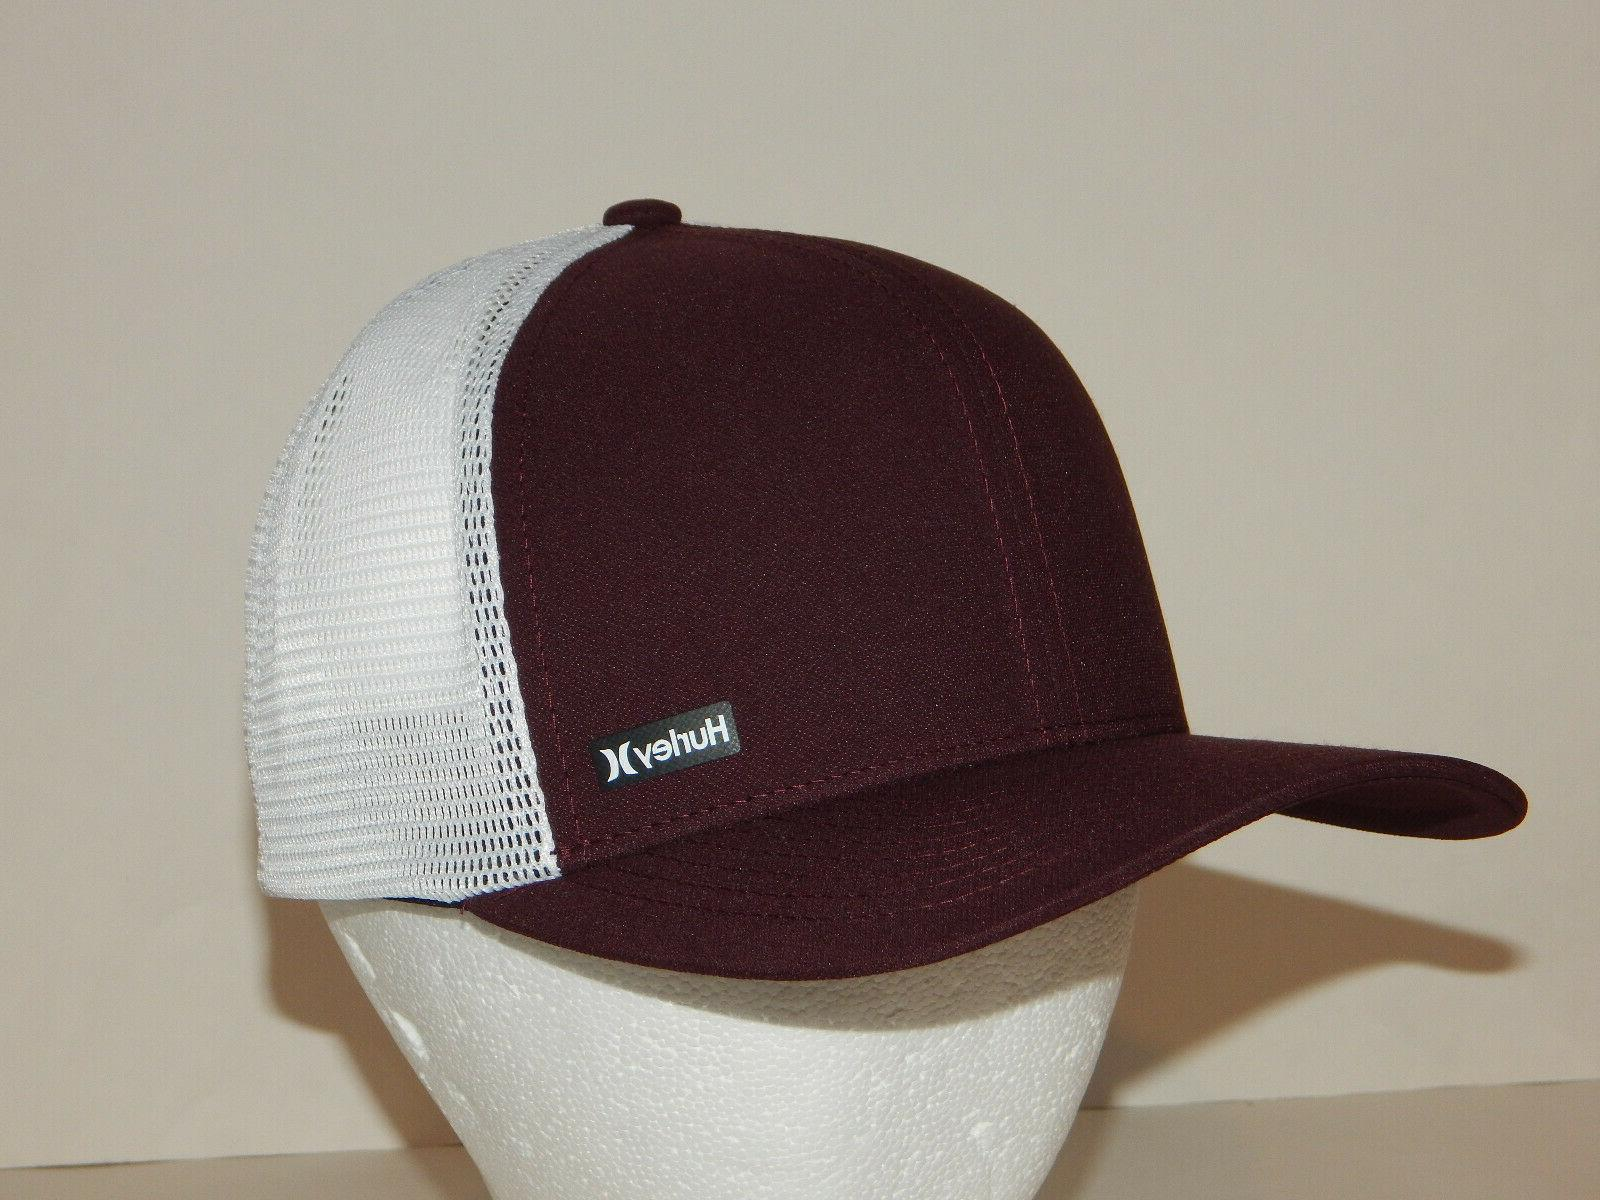 league trucker hat cap mesh snapback maroon